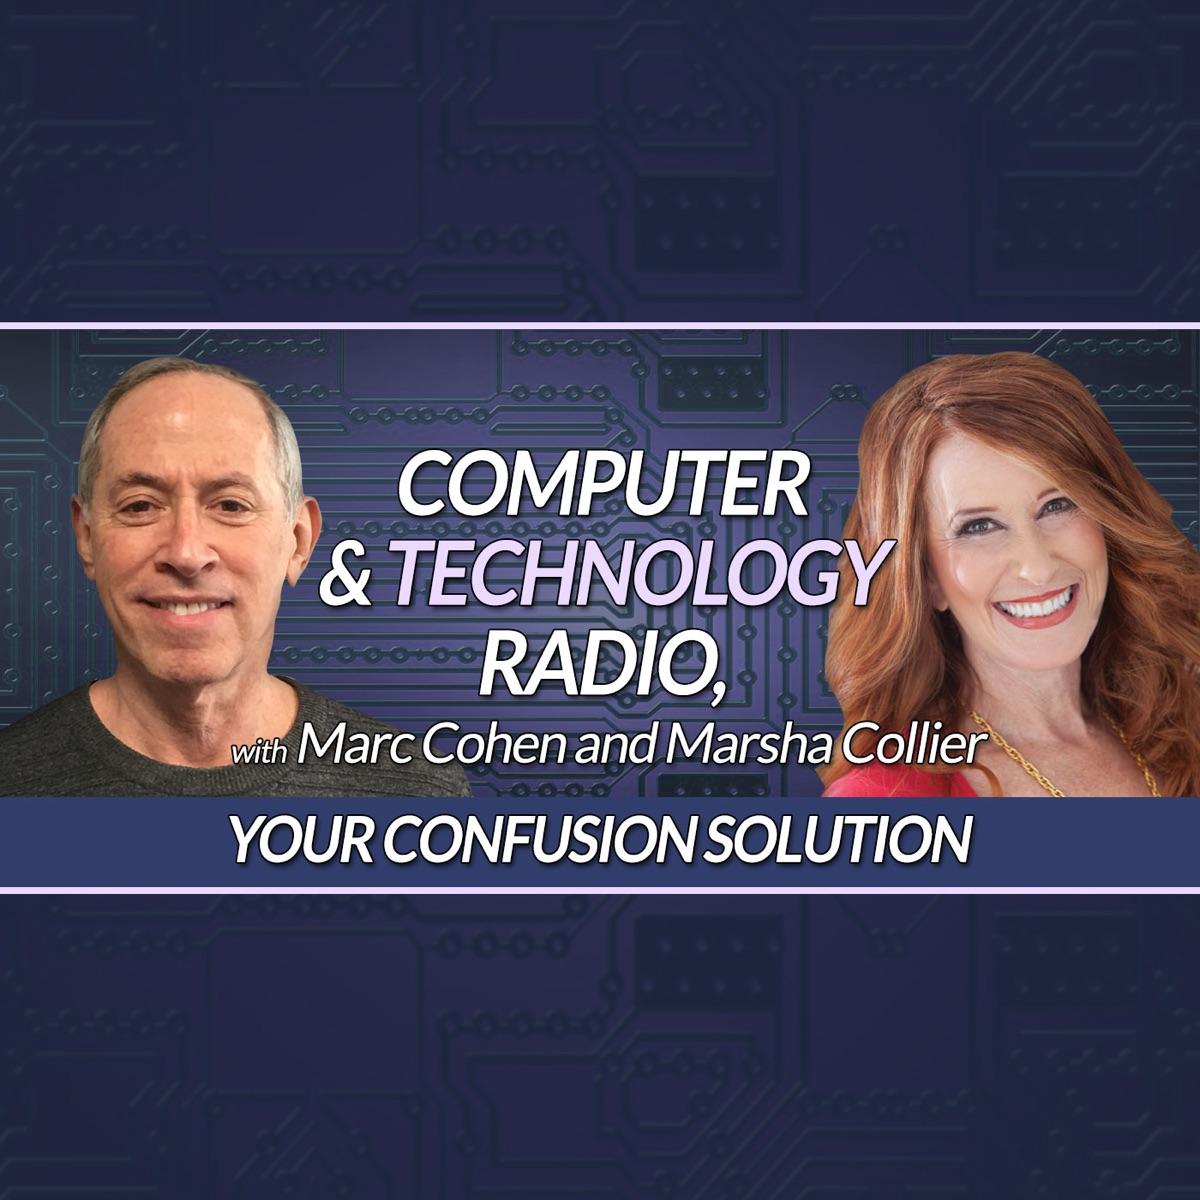 Marsha Collier & Marc Cohen Techradio by Computer and Technology Radio / wsRadio